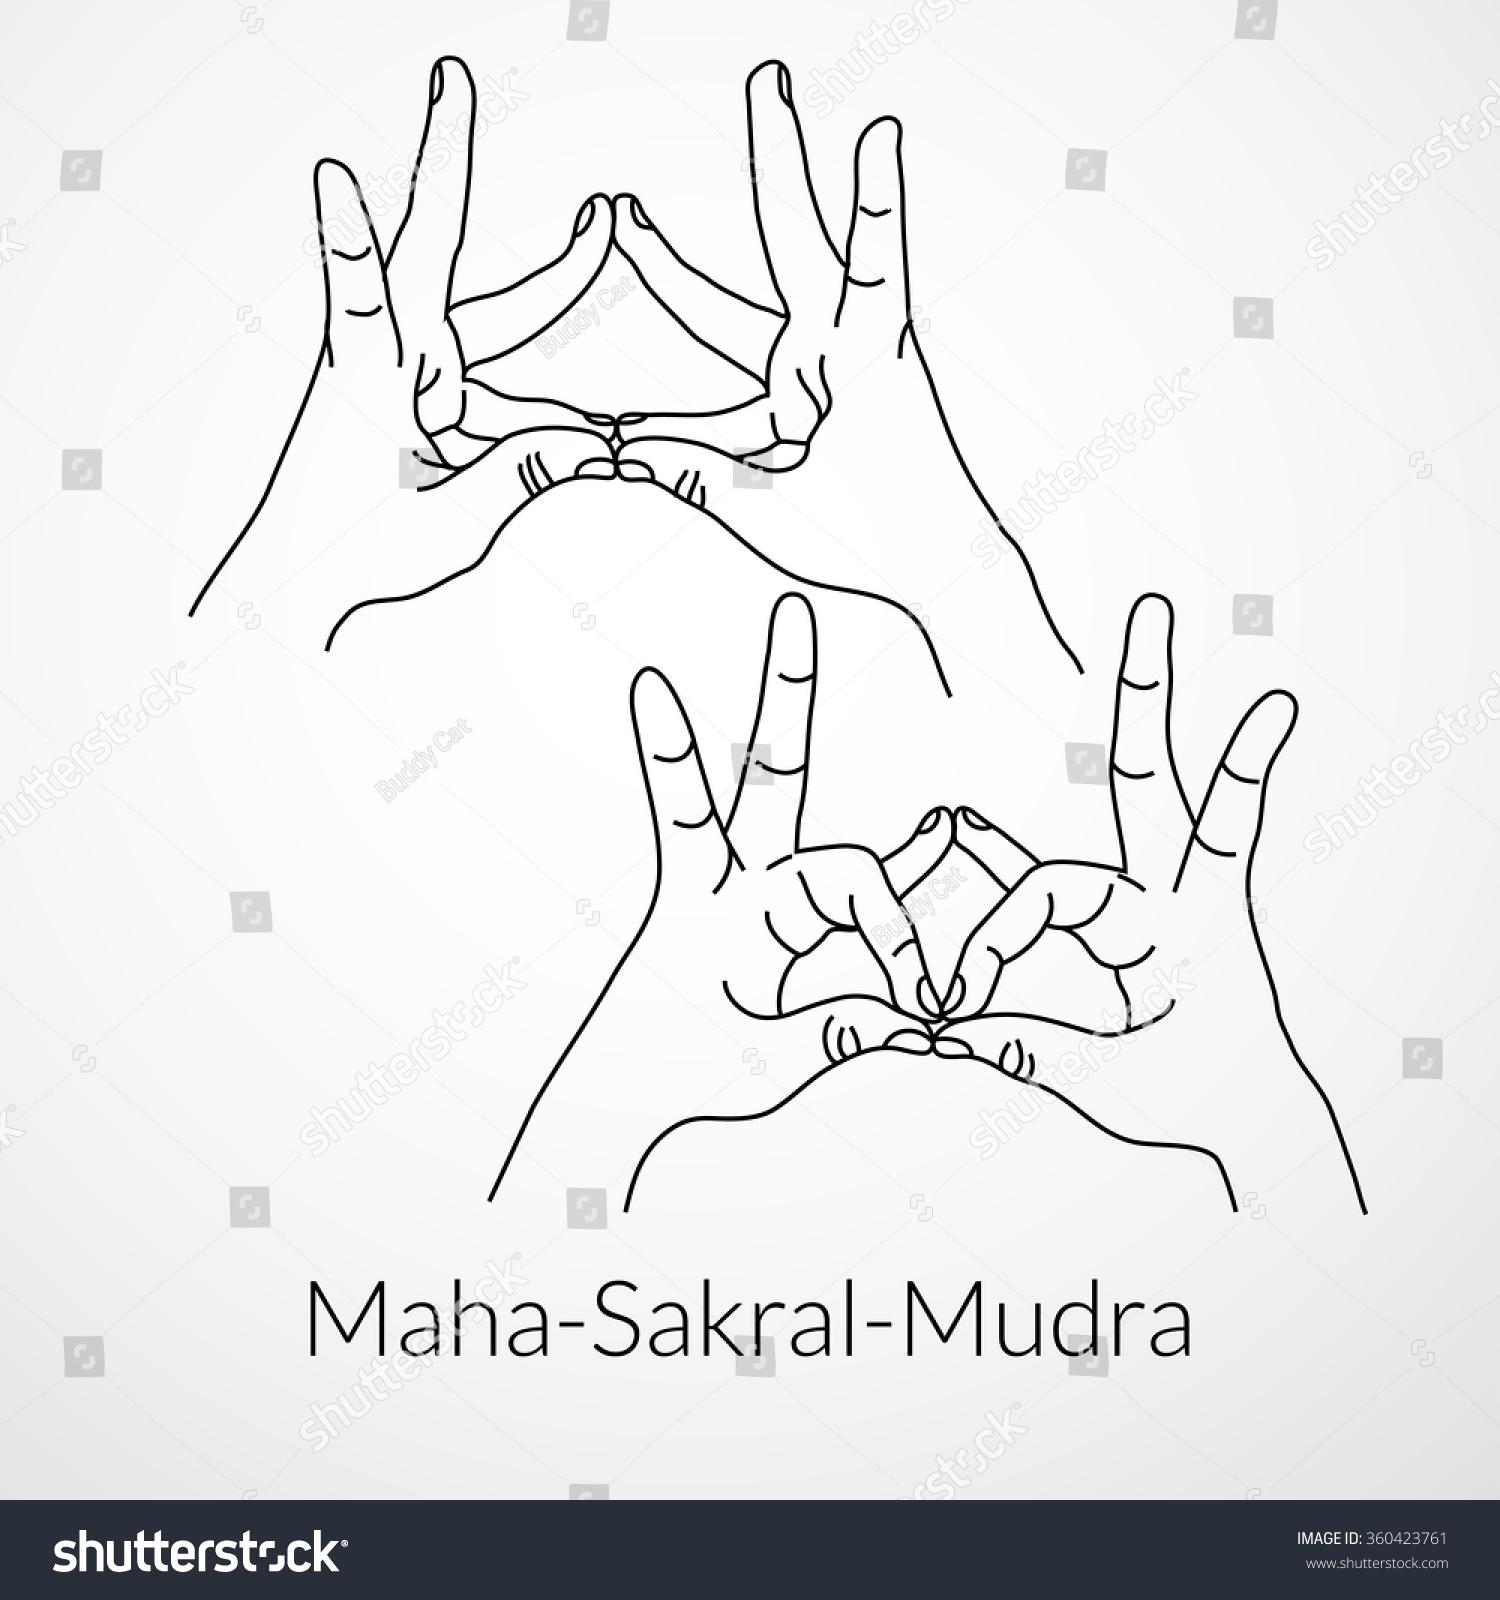 Hand Yoga Mudra Maha Sakral Mudra Vector Illustration Stock Vector ...